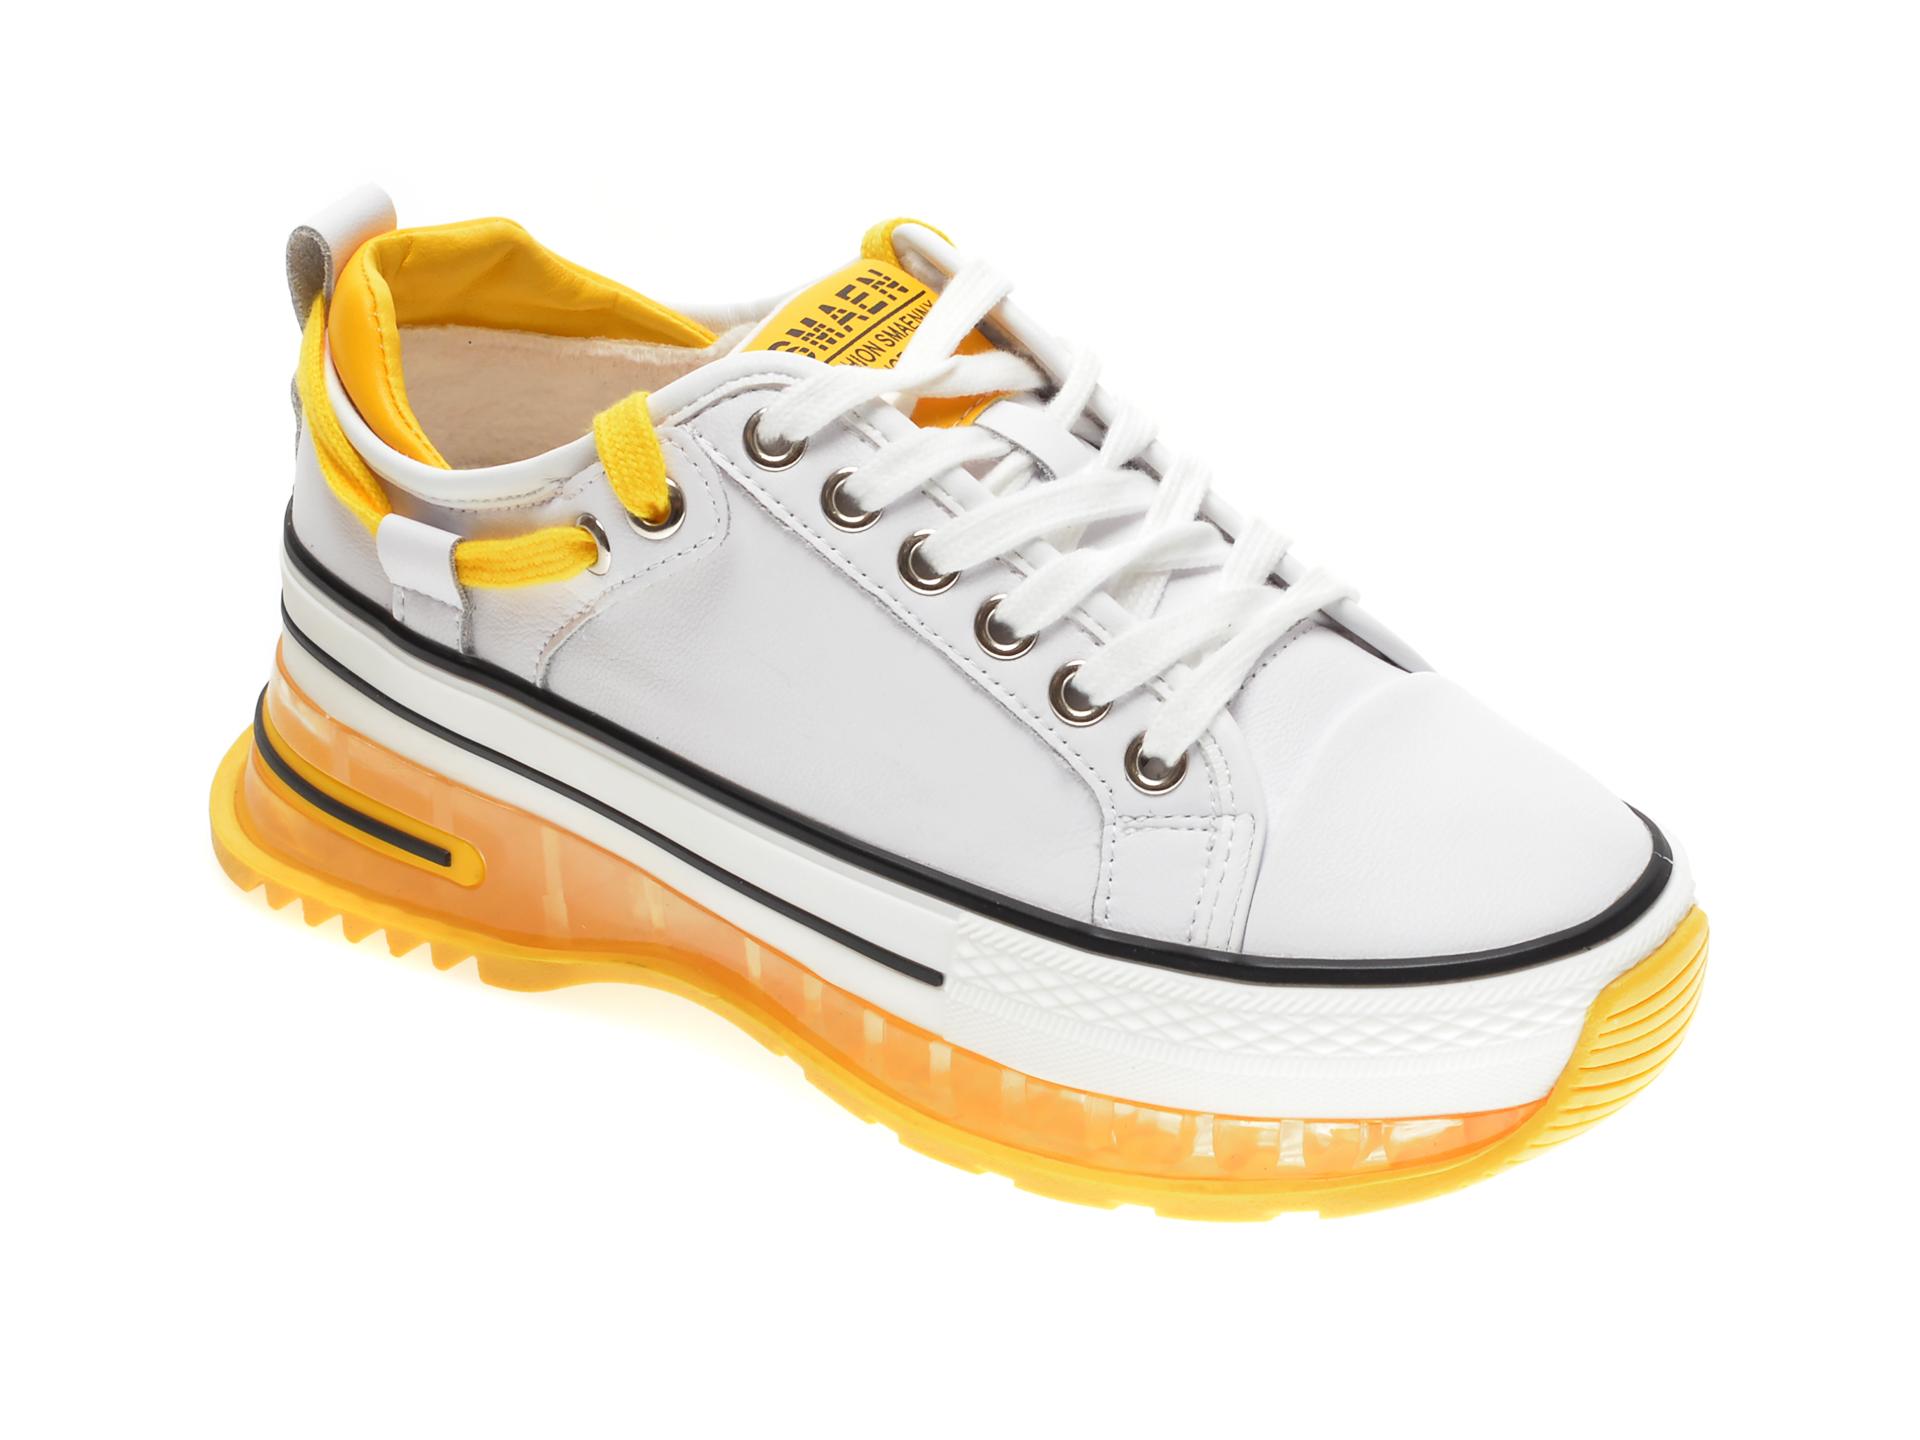 Pantofi sport GRYXX albi, 20208, din piele naturala New